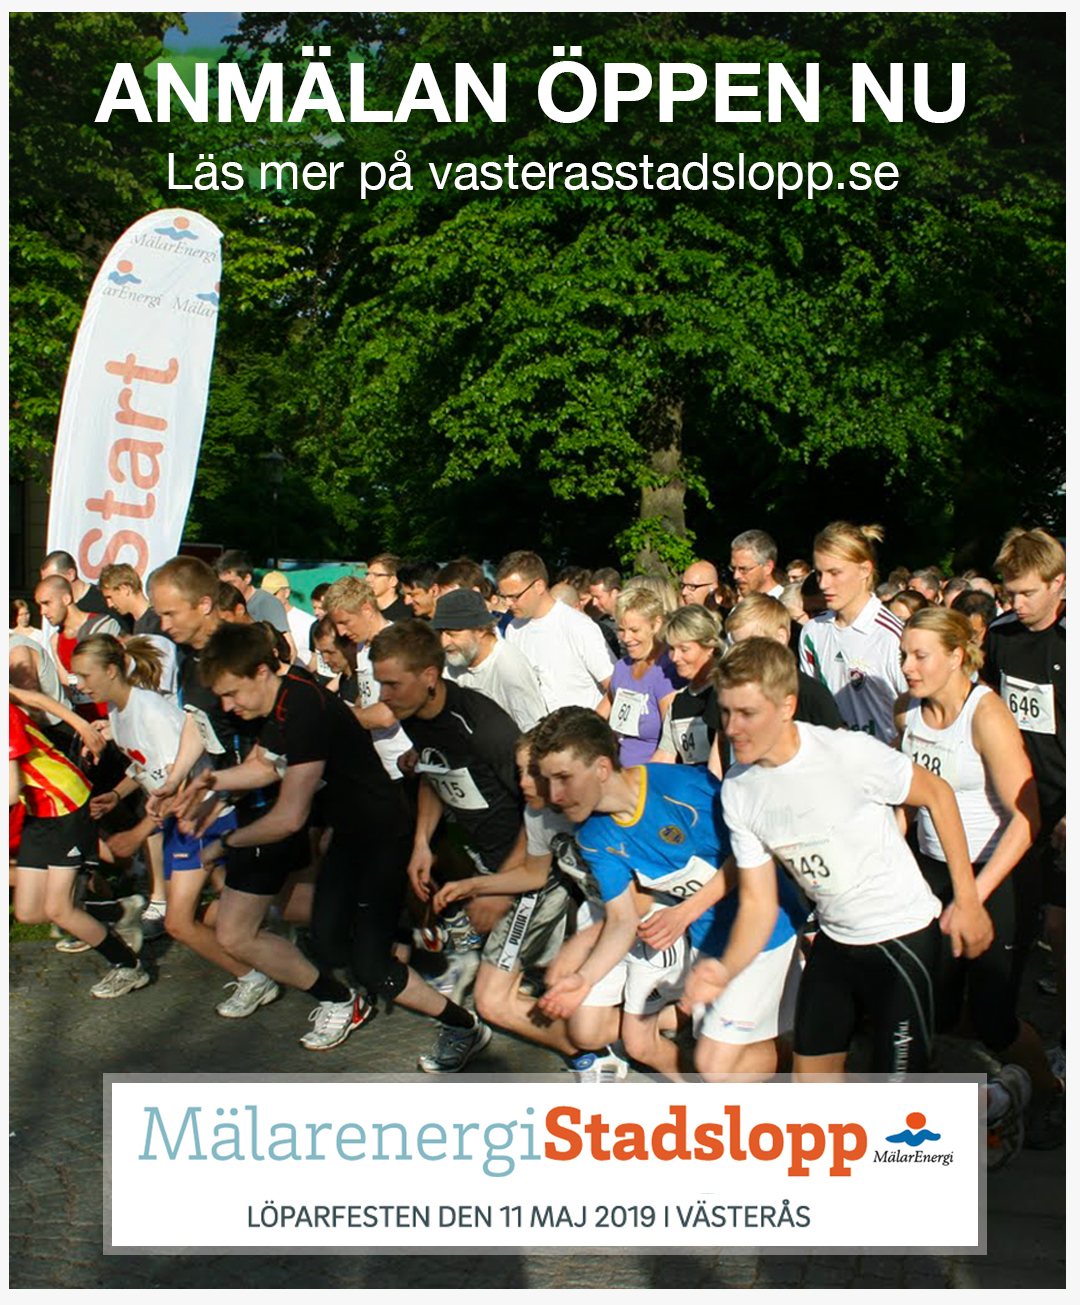 Stadsloppet Västerås Businesschannel.jpg